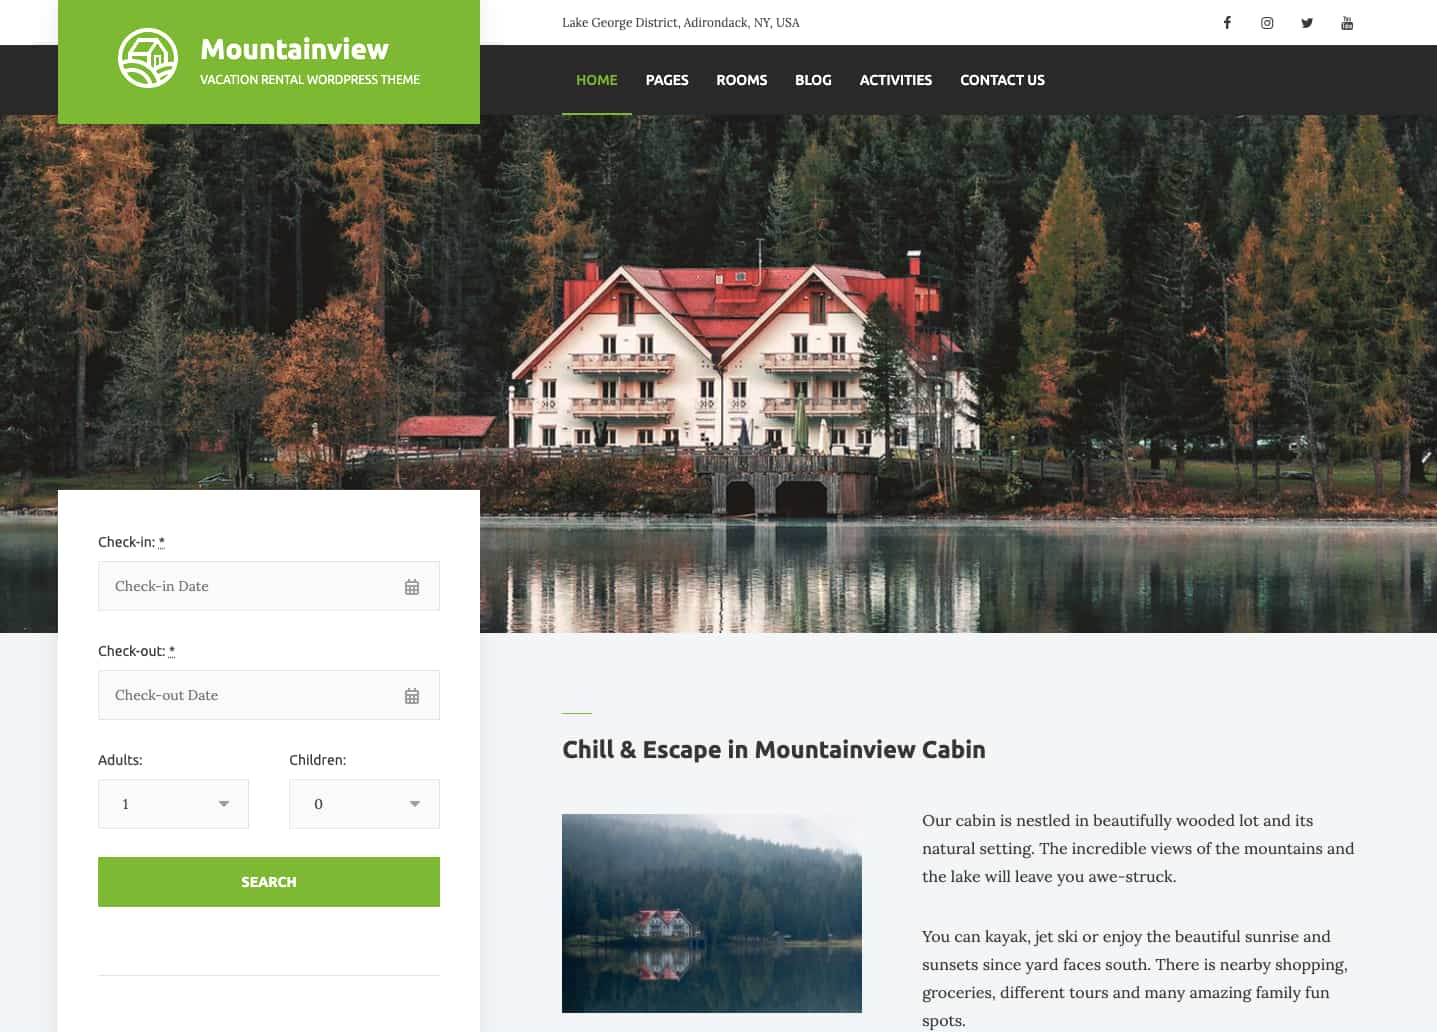 WordPress site with custom booking form created via Hotel Booking Lite plugin